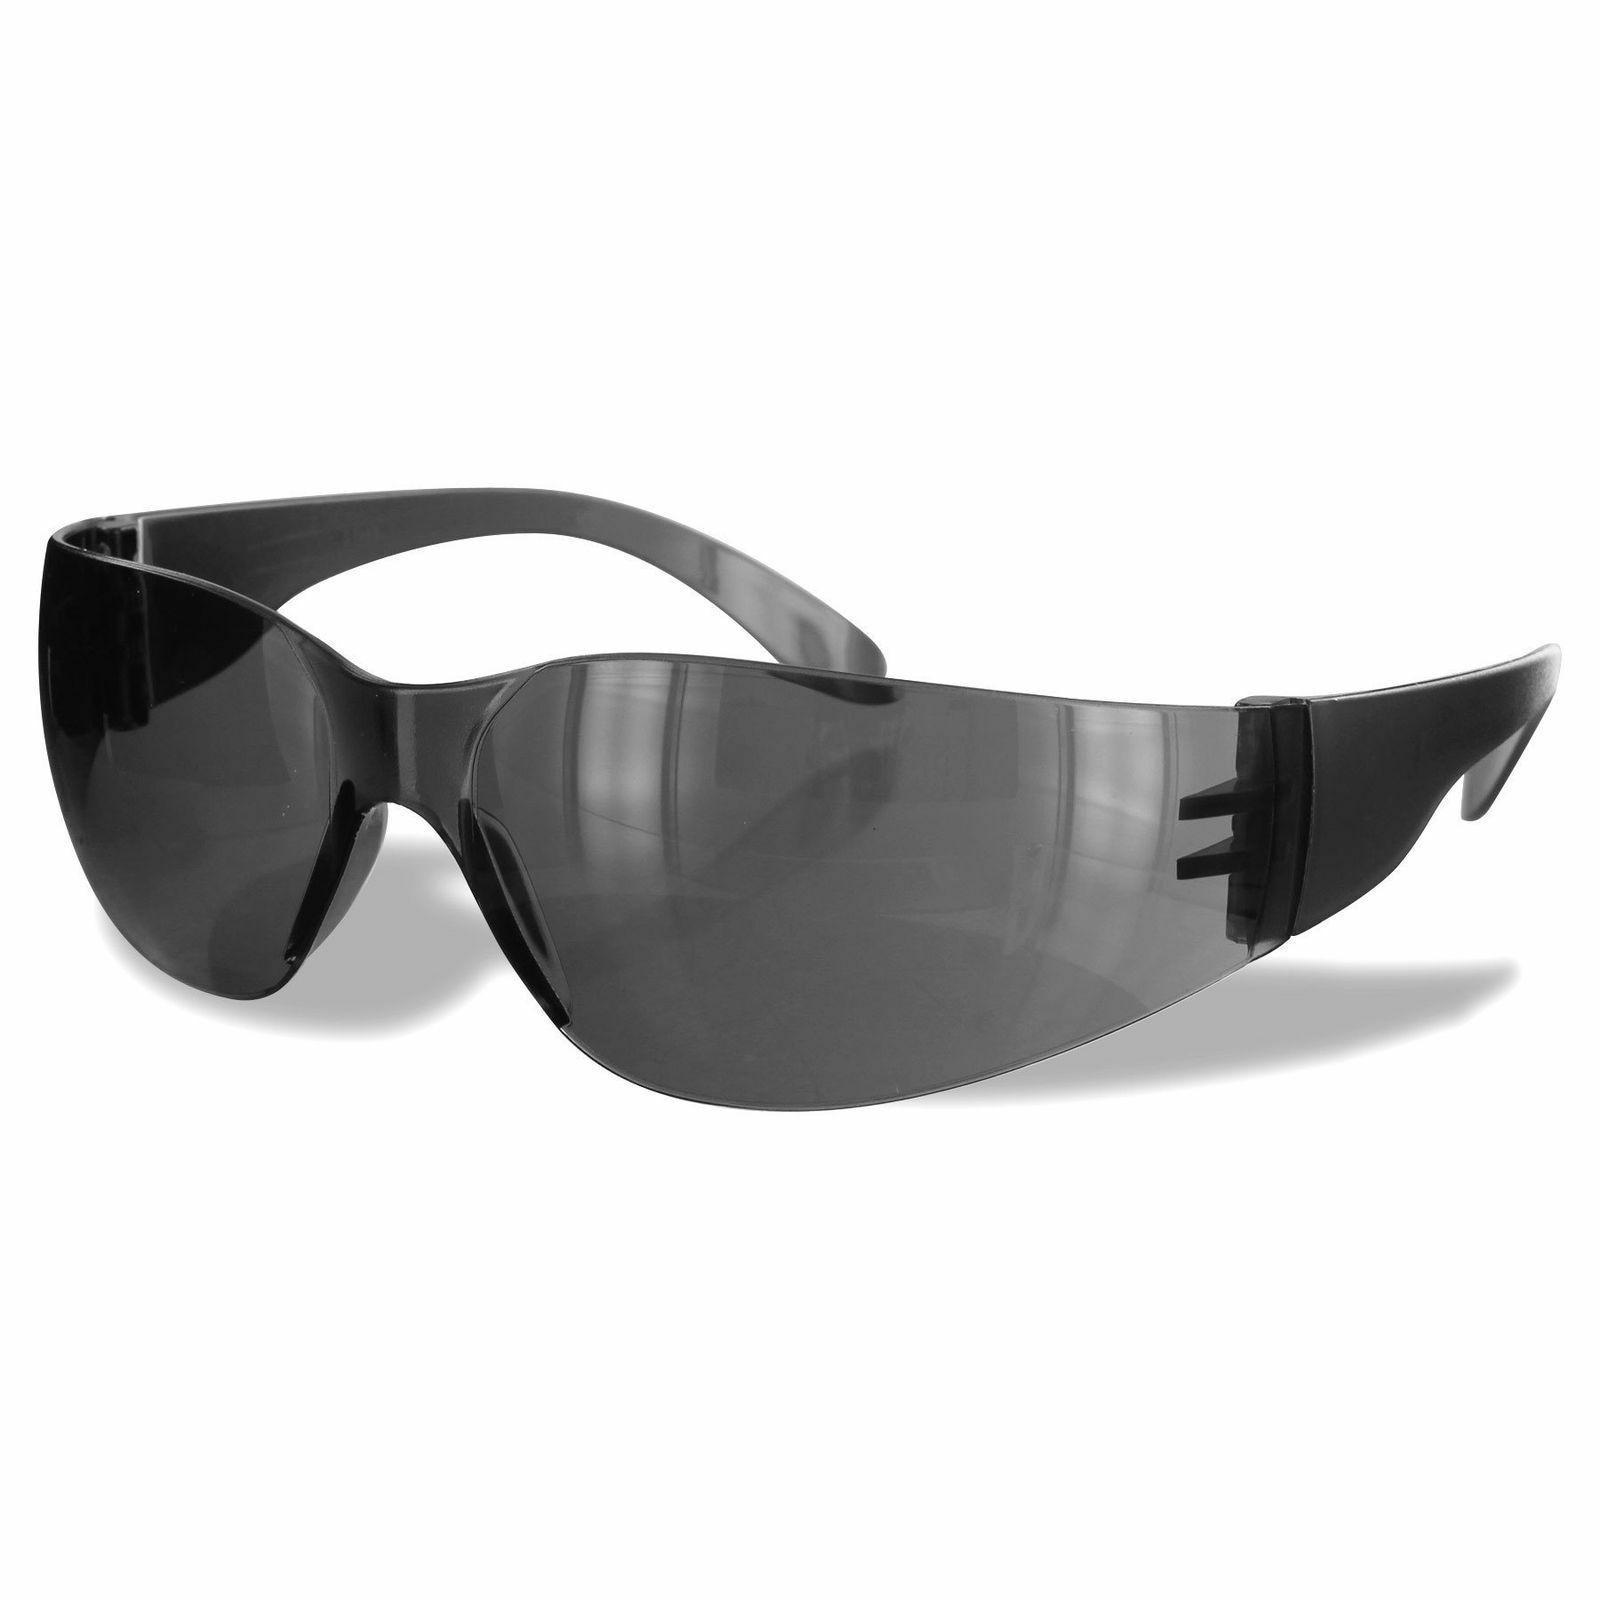 polycarbonate safety glasses uv 400 scratch resistant